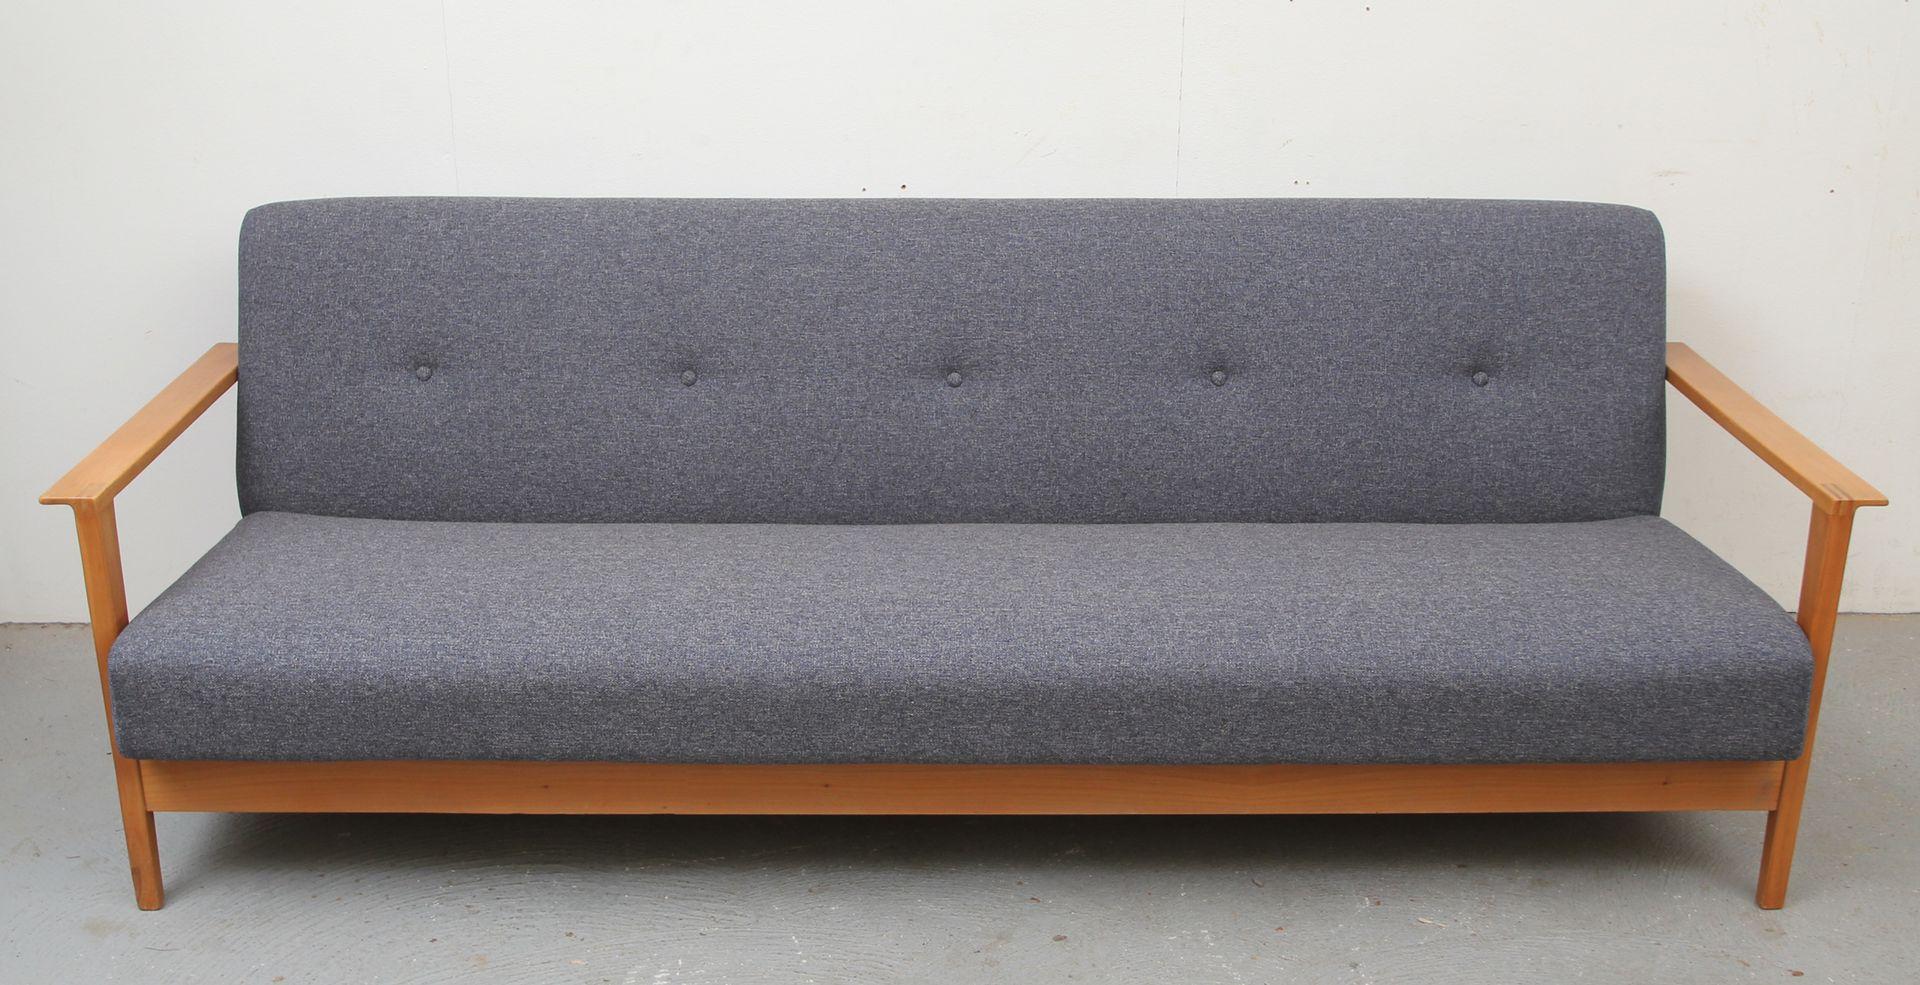 foldable wooden sofa set bed atlanta cherry wood folding 1960s for sale at pamono